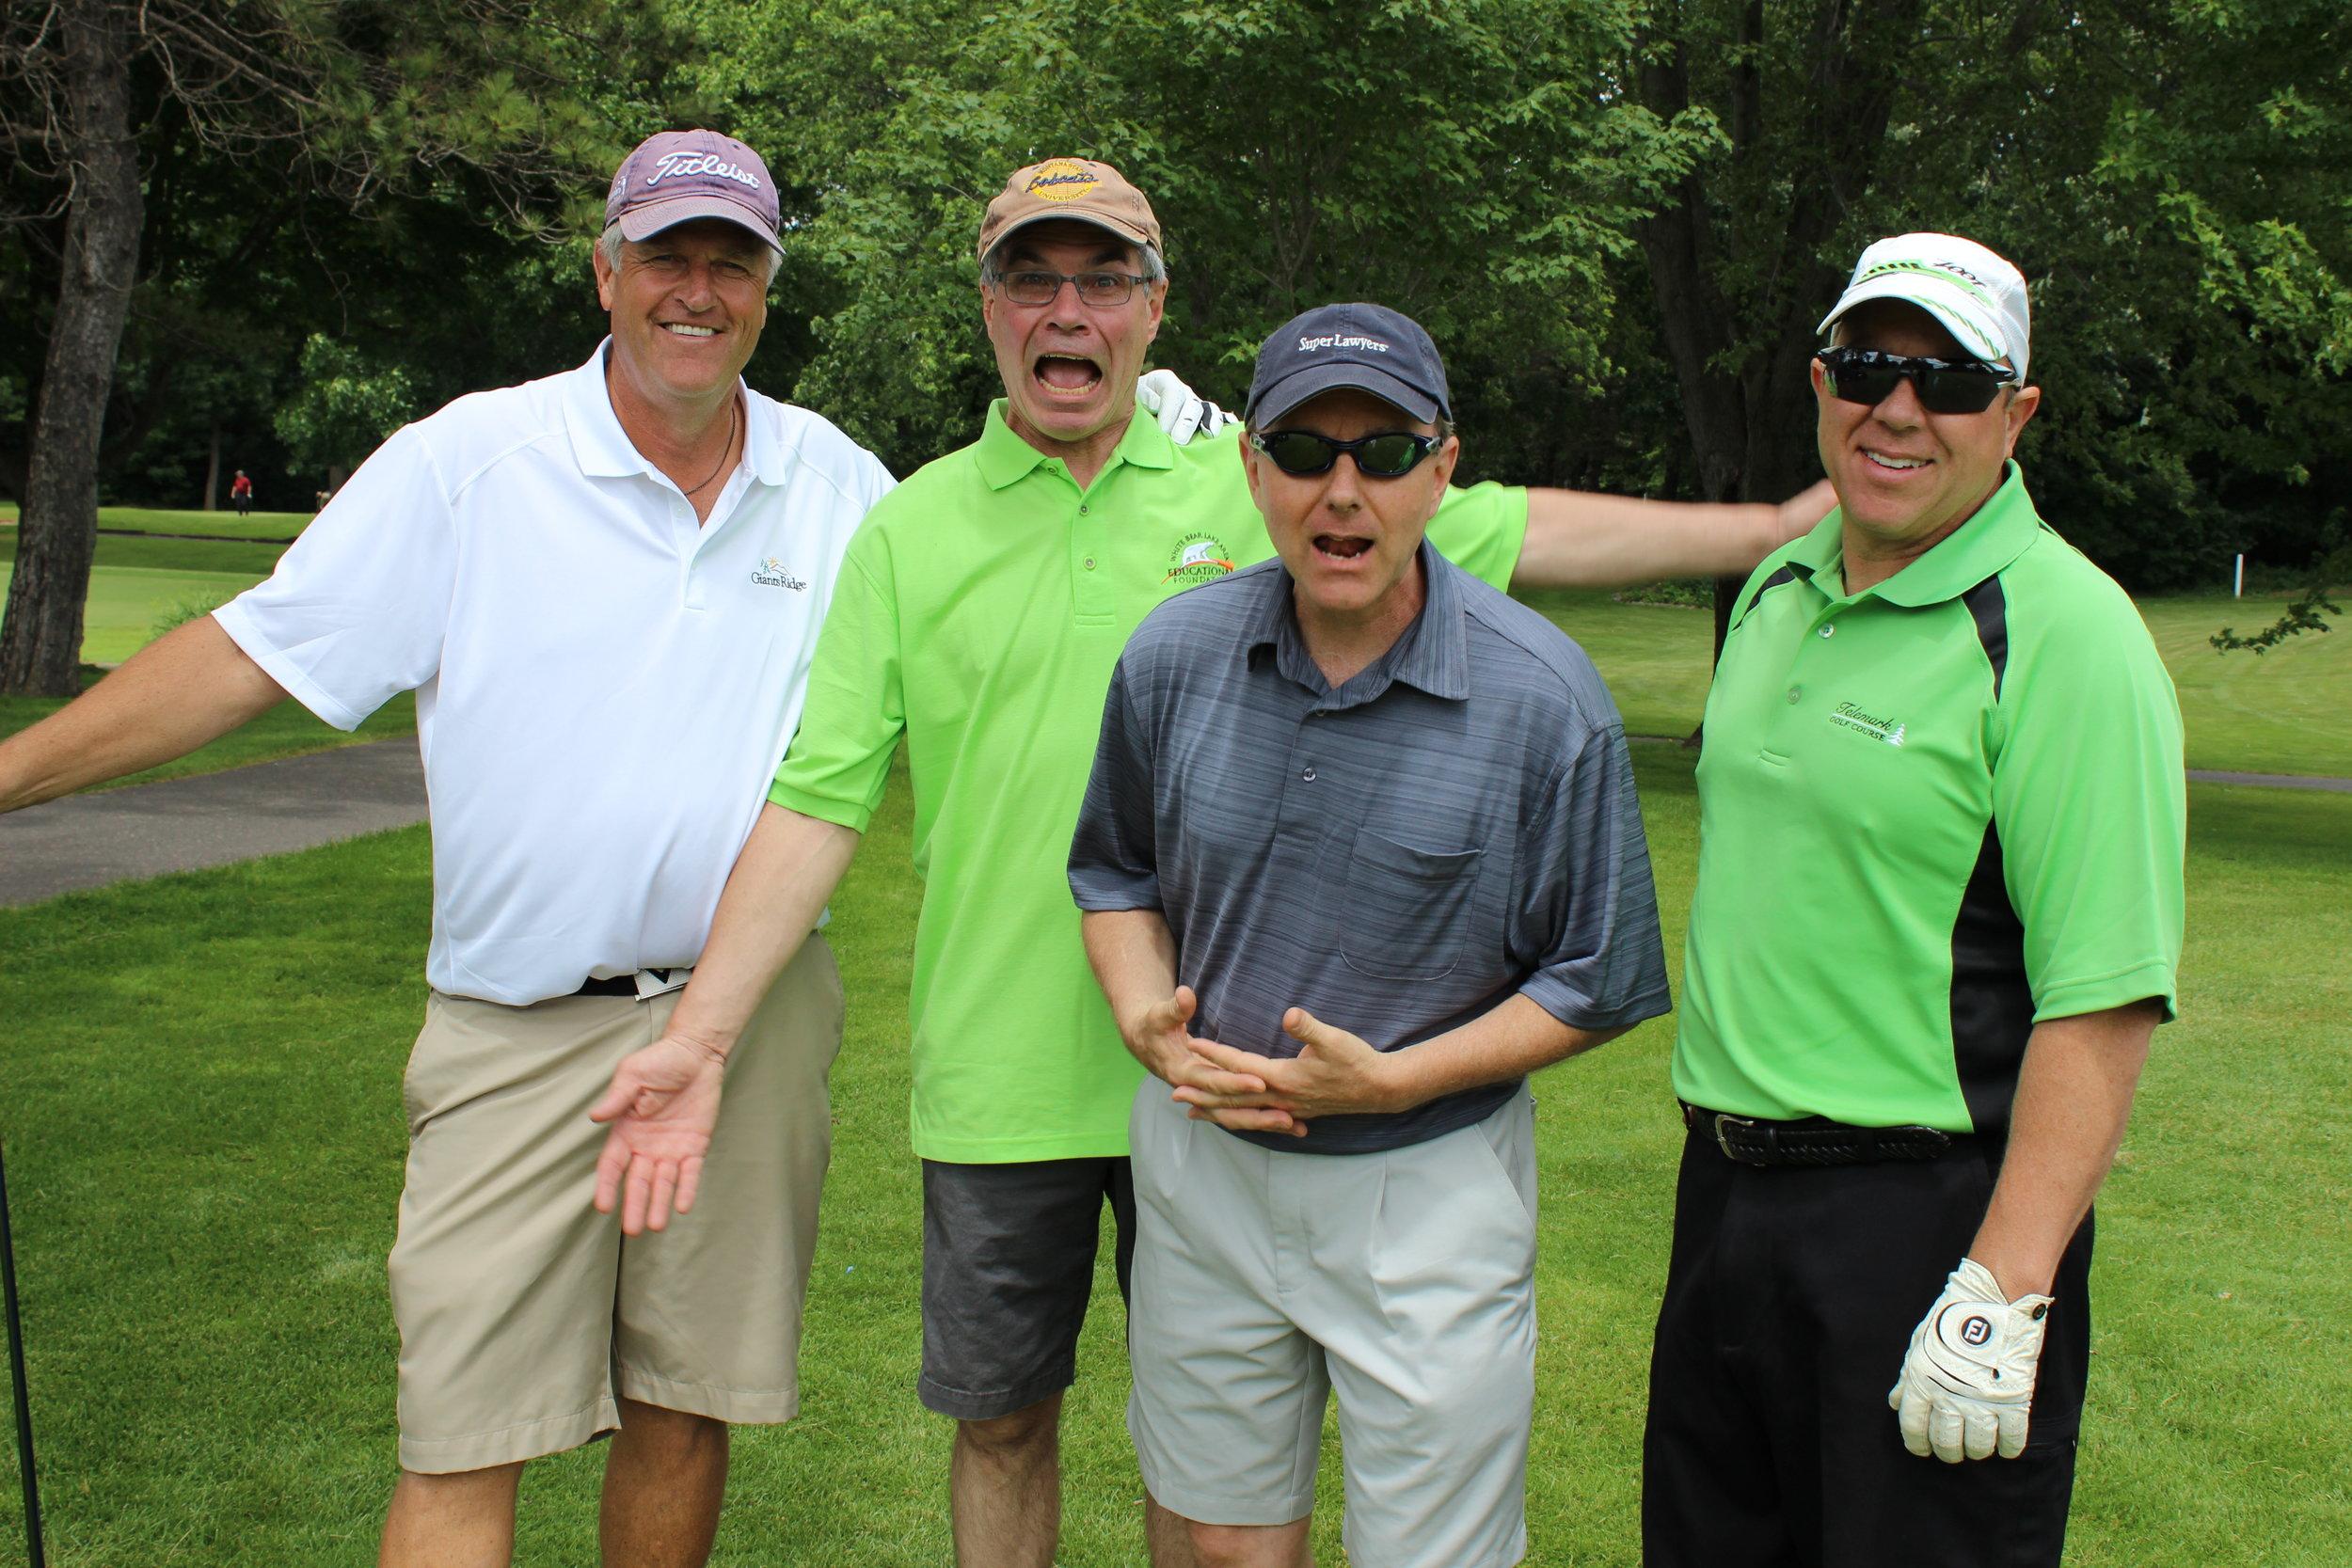 Bob Dempsey, Rick Storey, Scott Heins, Pat Kinney.jpg